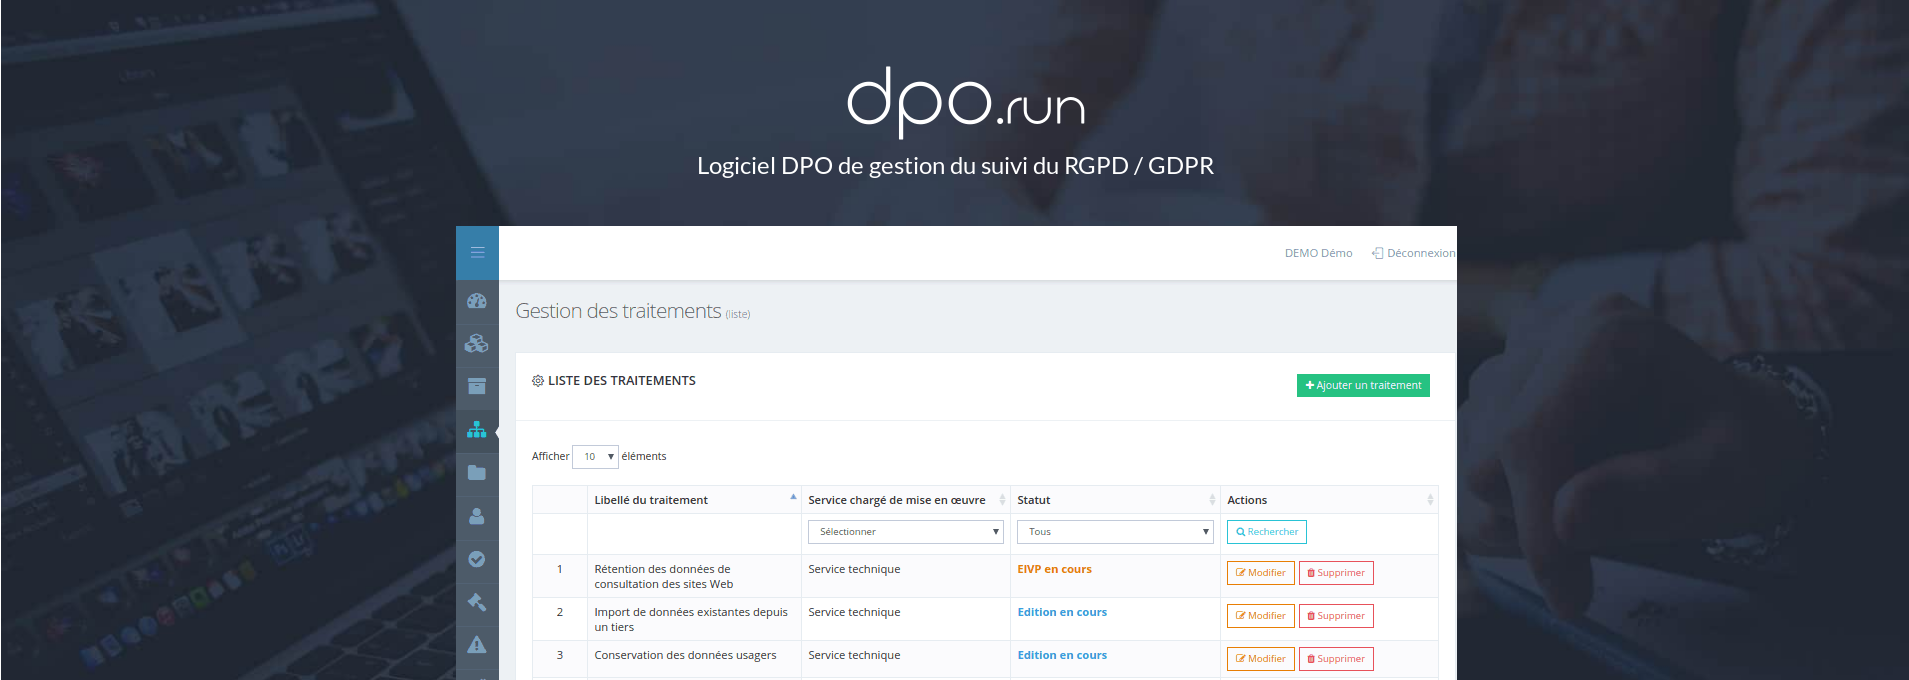 Avis DPO.run : Logiciel RGPD DPOrun - Appvizer